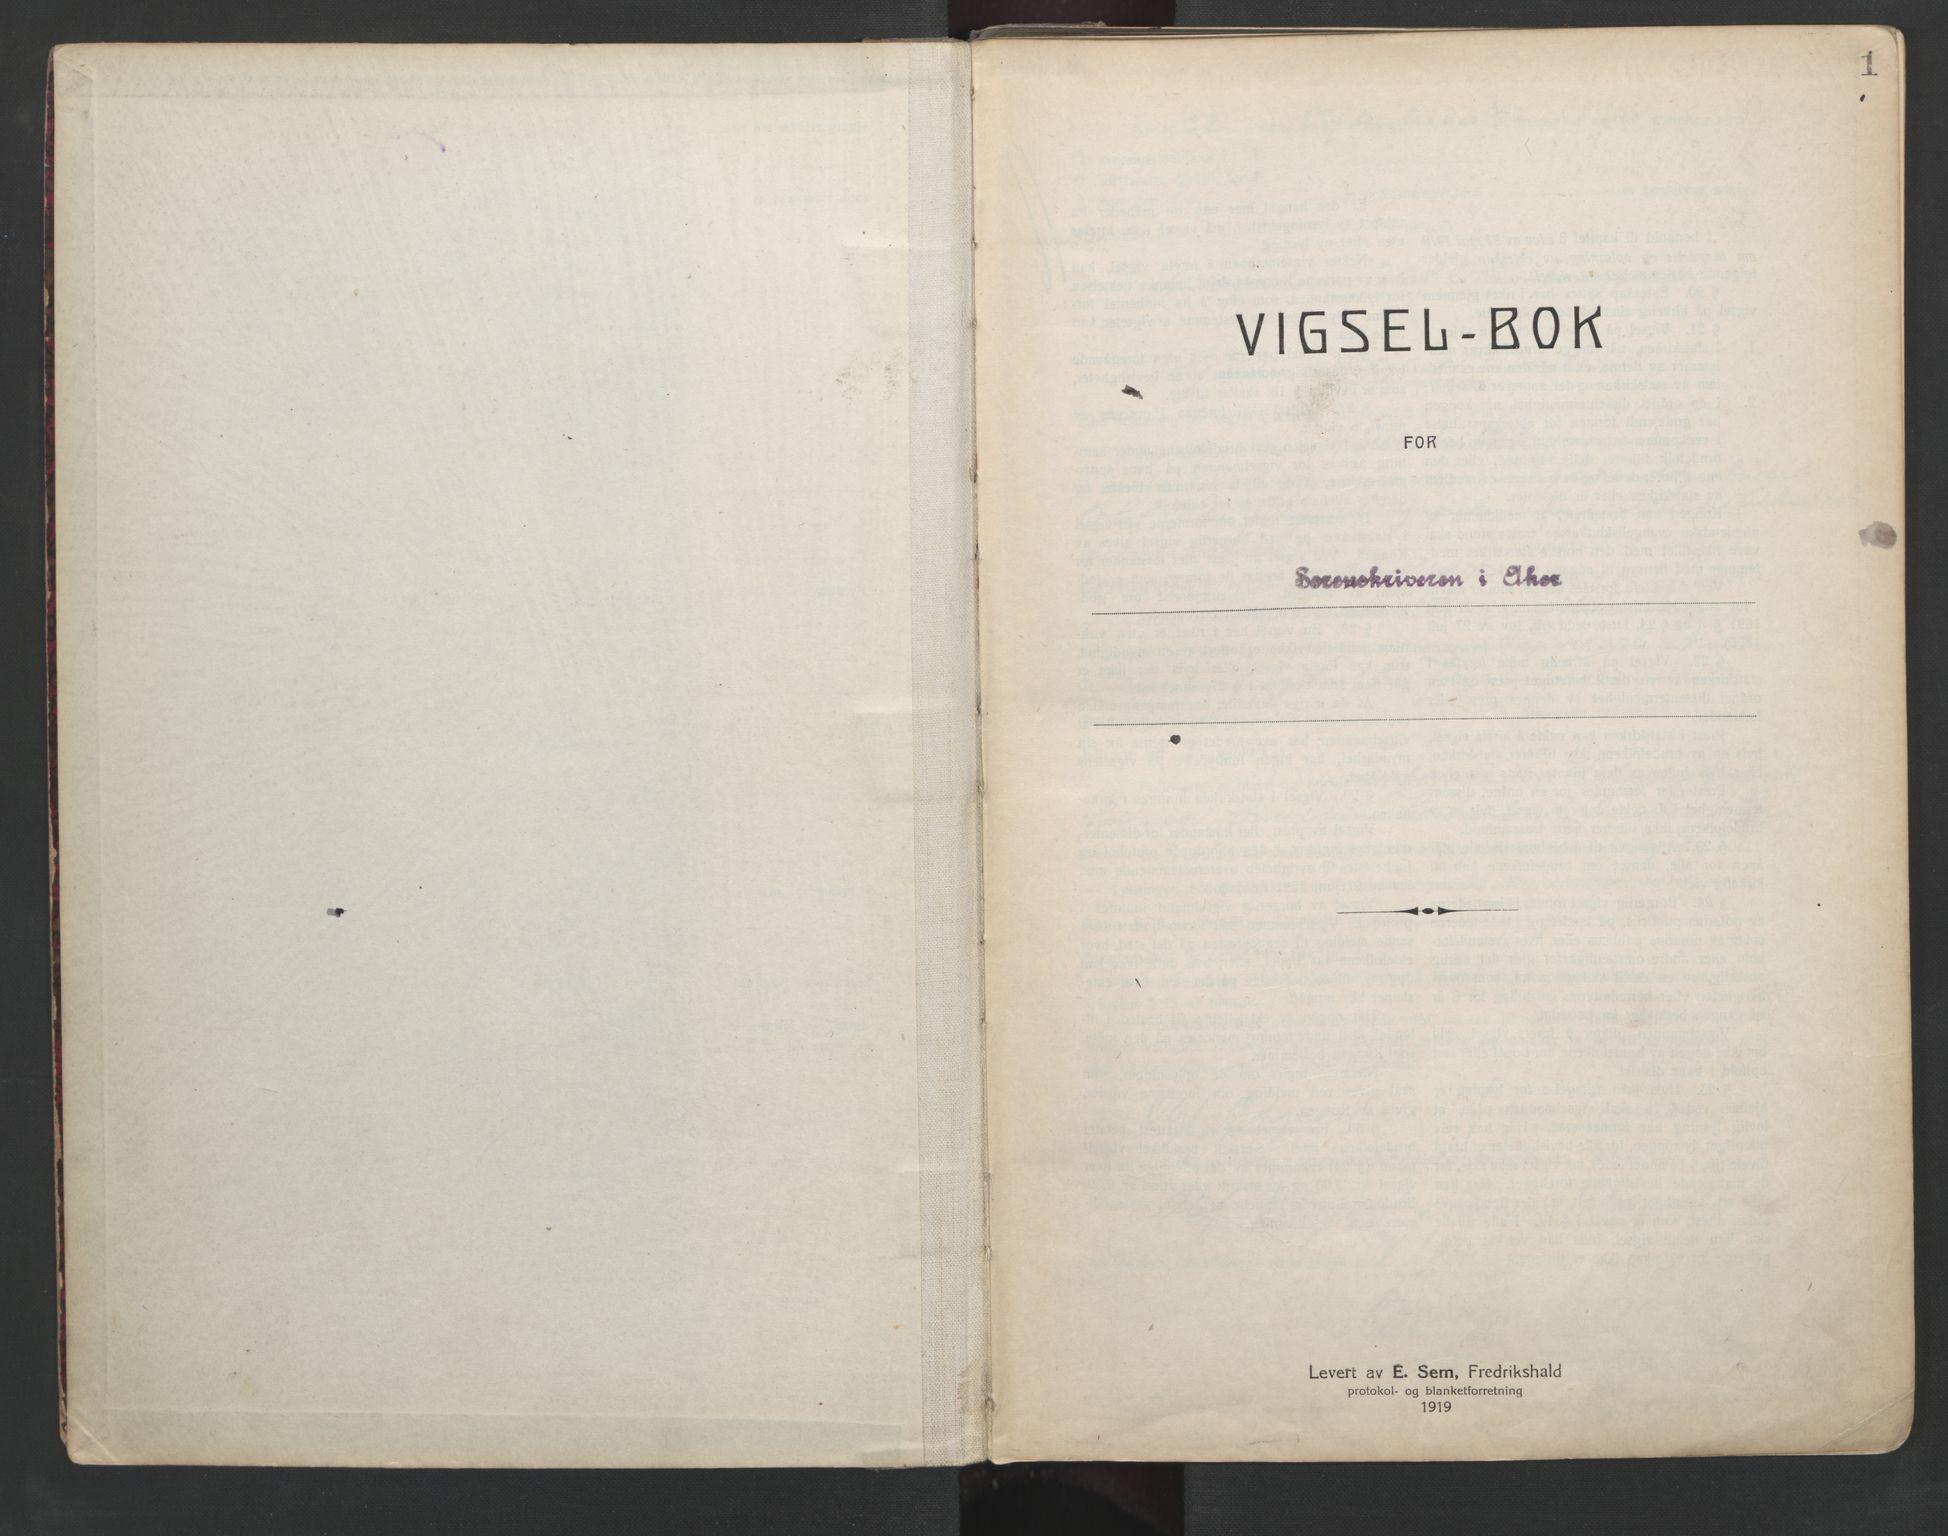 SAO, Aker sorenskriveri, L/Lc/Lcb/L0002: Vigselprotokoll, 1922-1924, s. 1